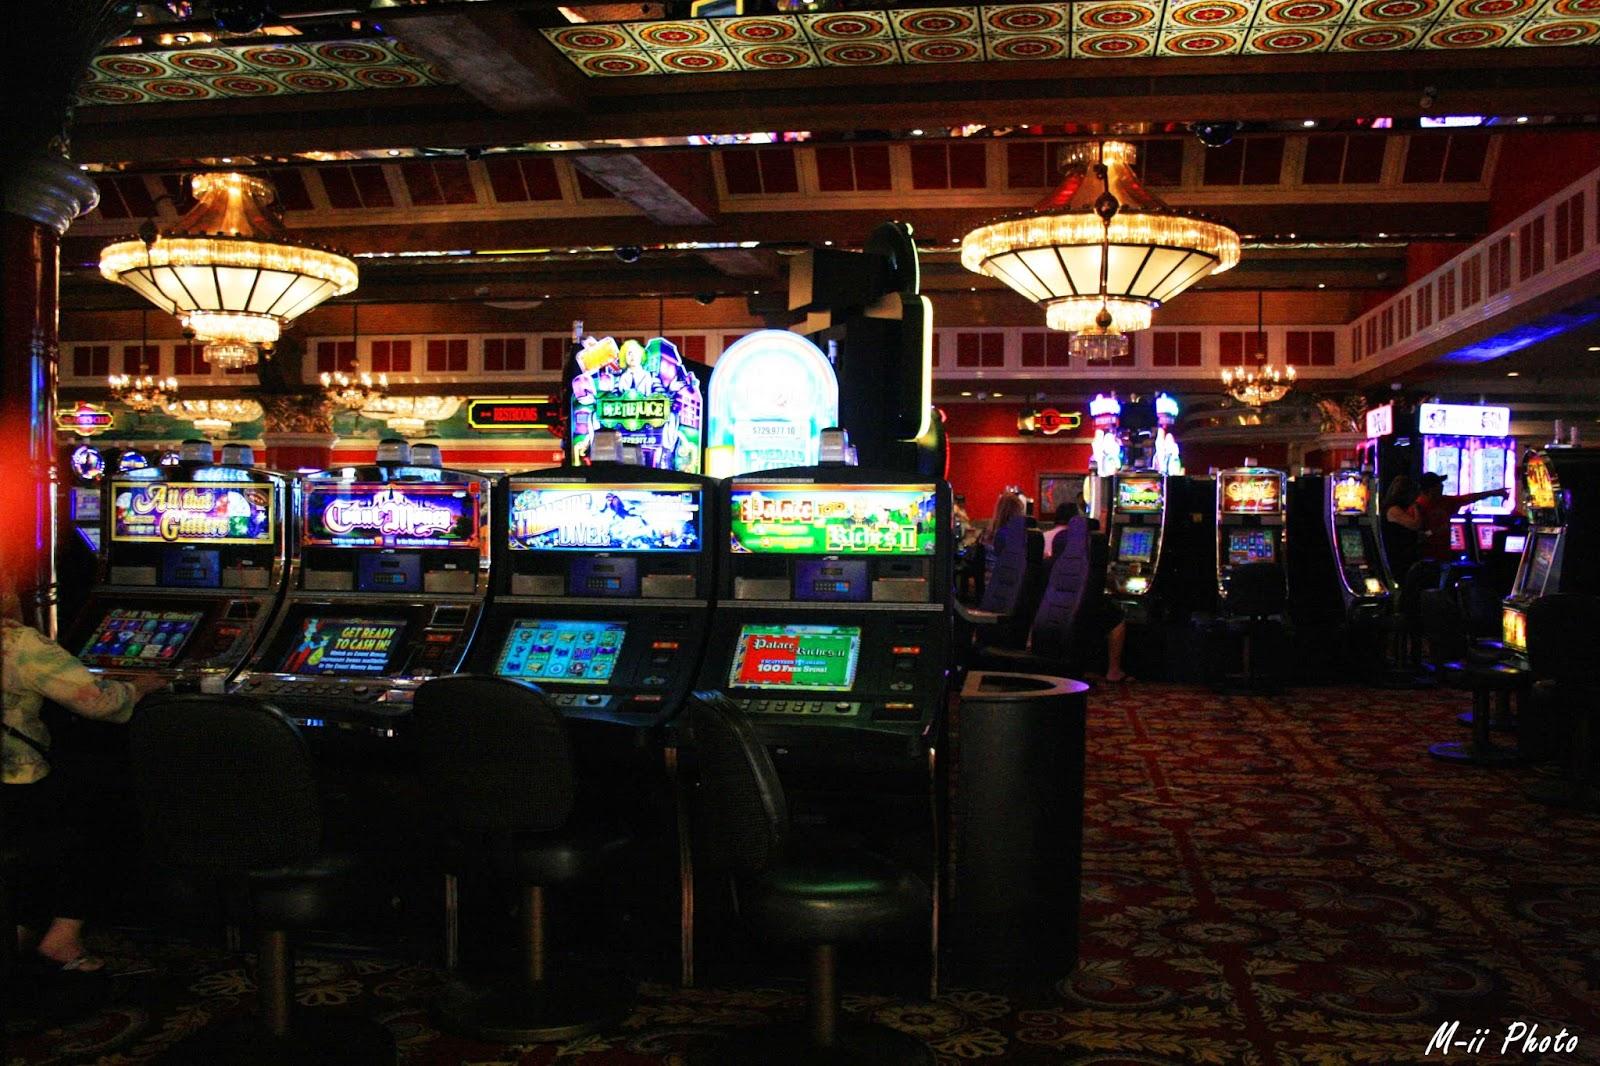 M-ii Photo : Las Vegas